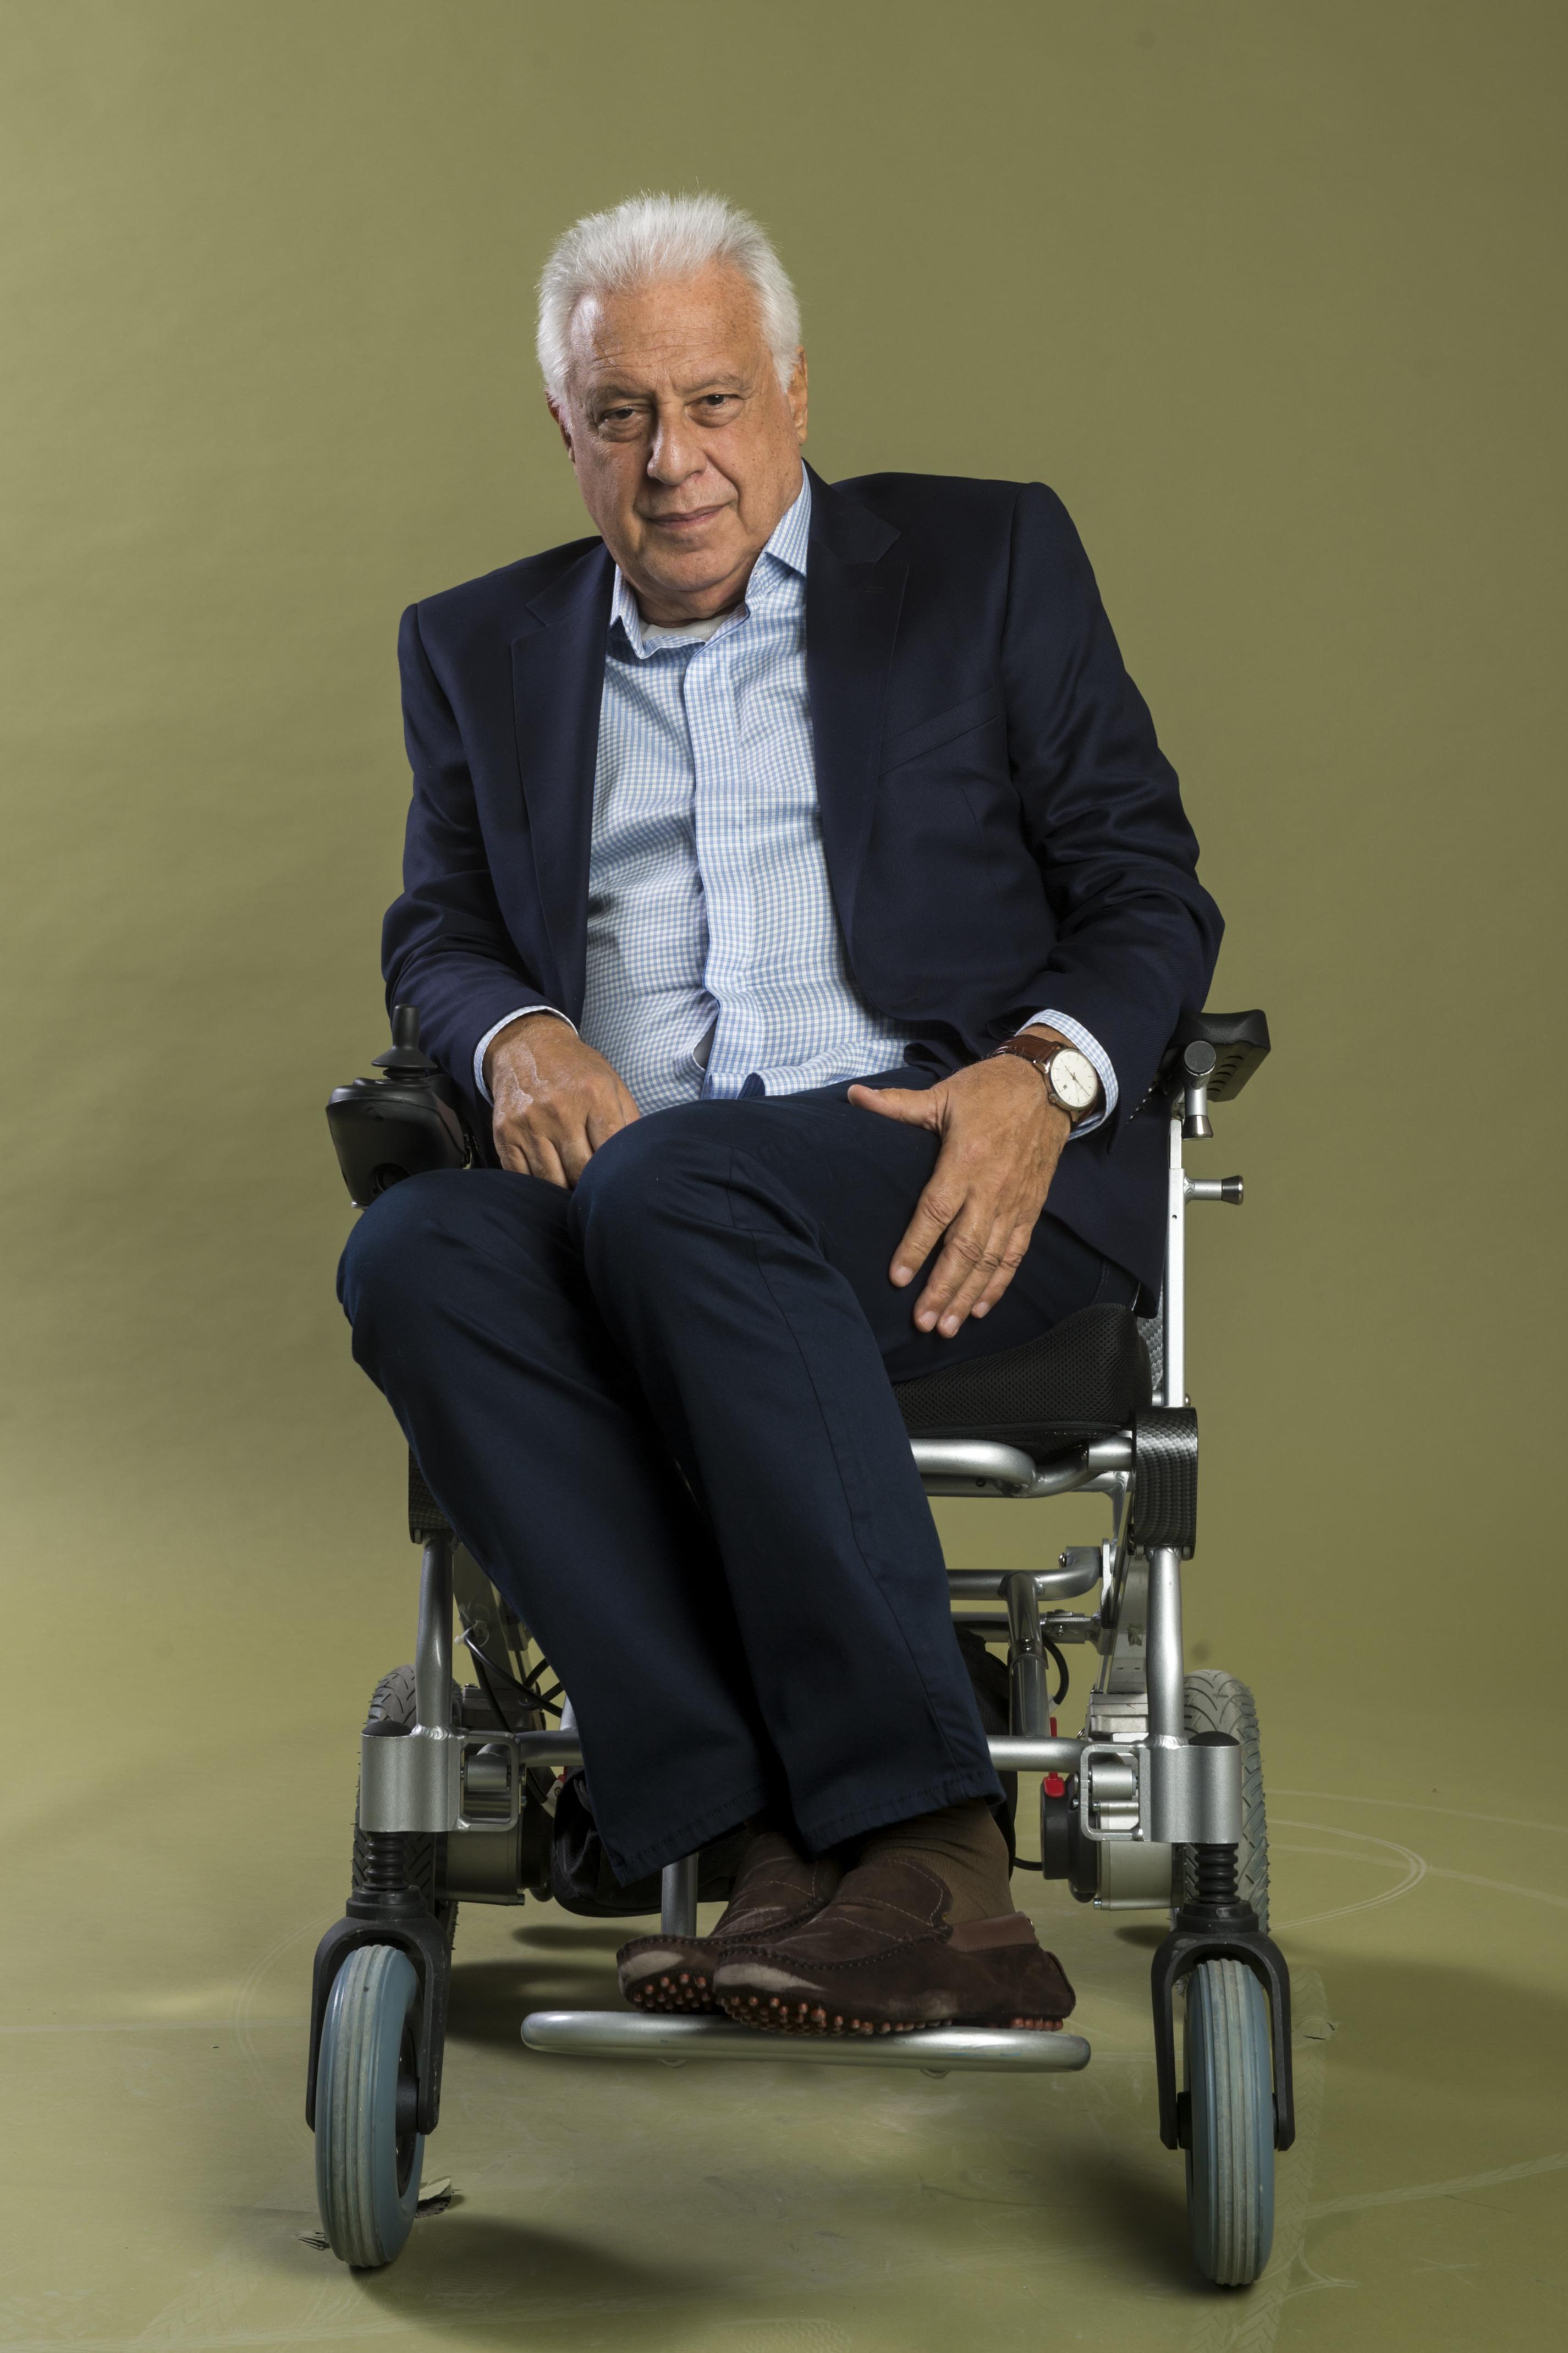 Alberto ( Antonio Fagundes ) de Bom Sucesso